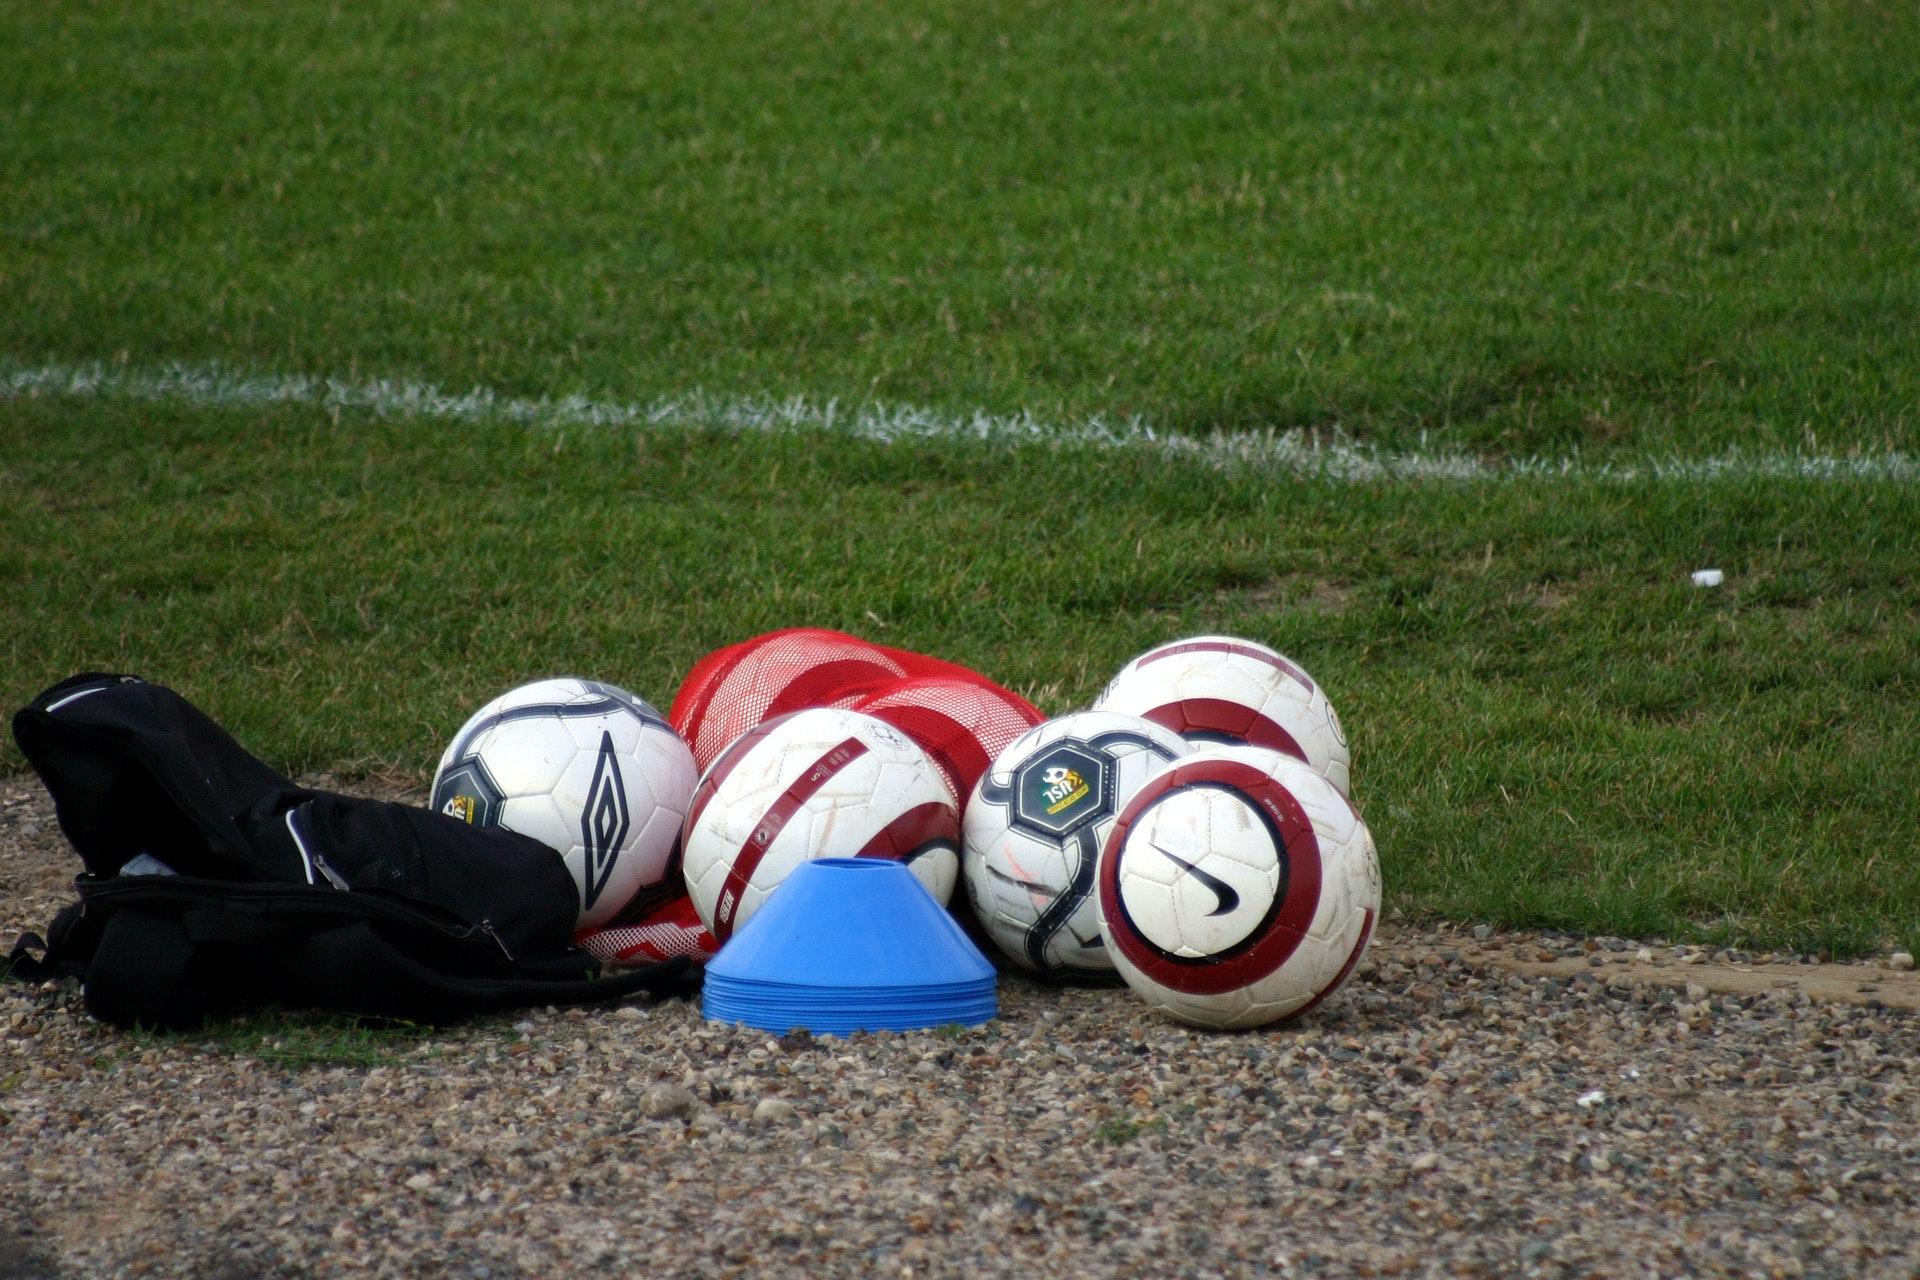 Best pregame soccer workouts